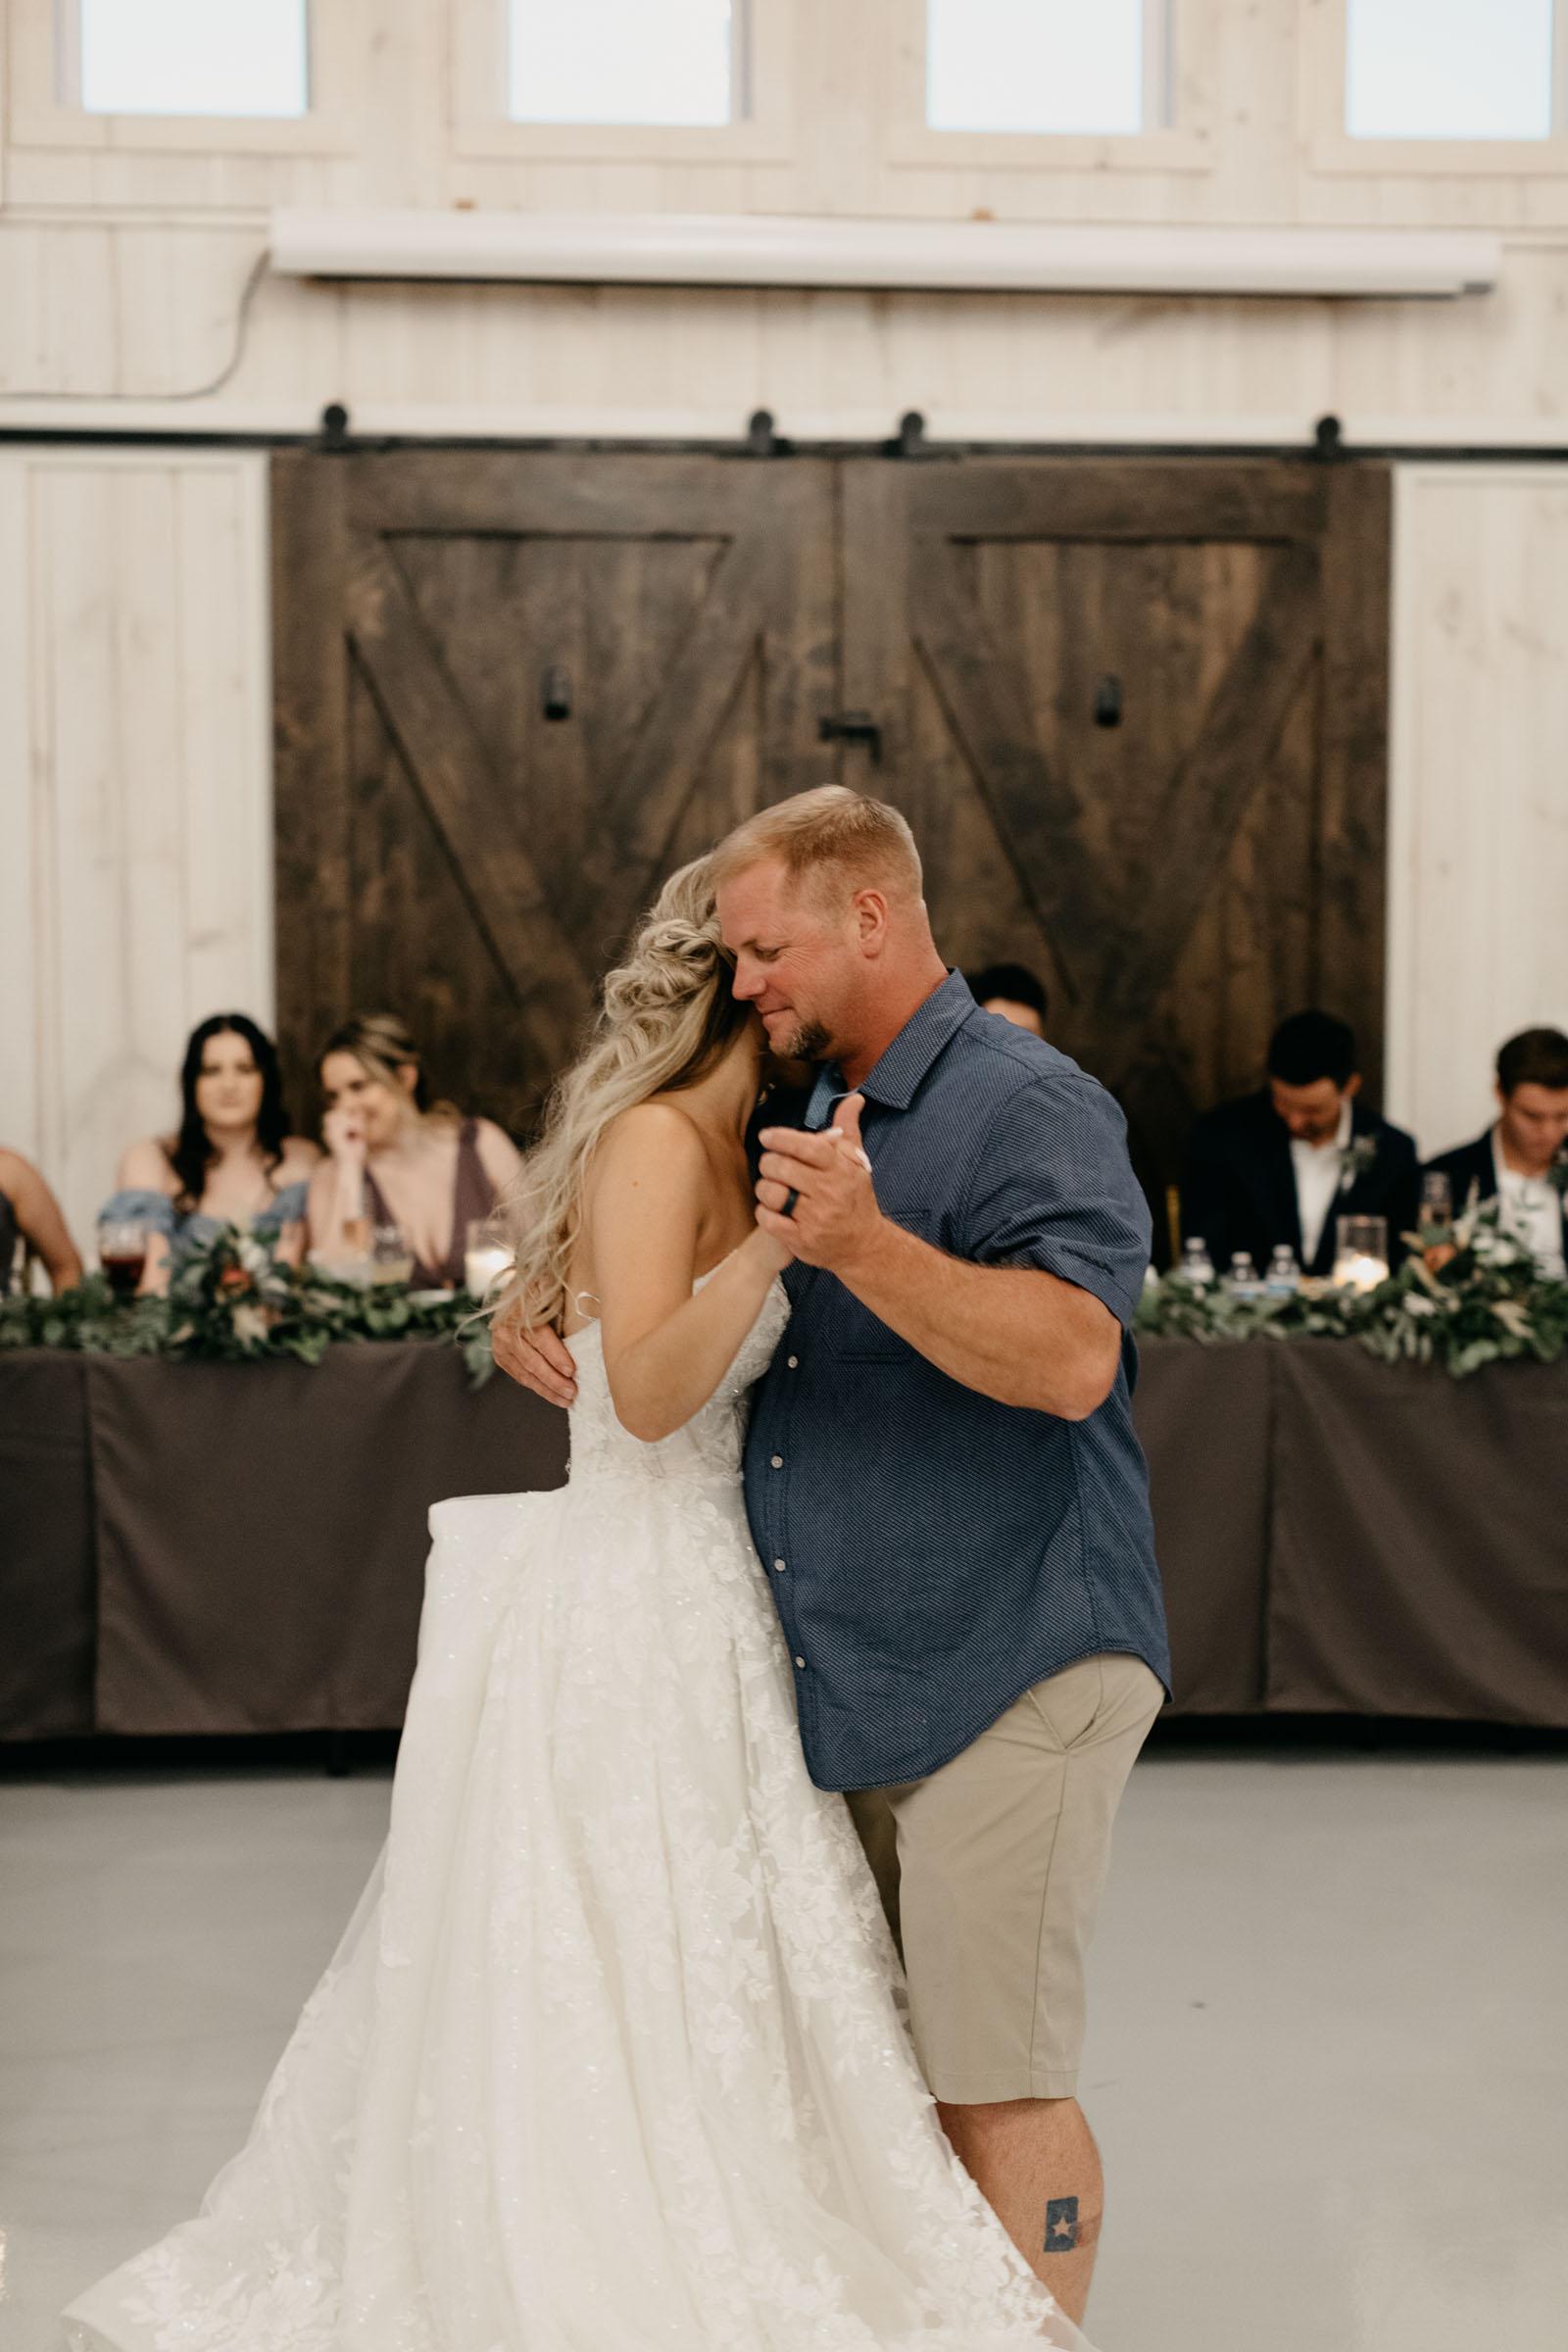 wedding reception space at one Preston events in Gunter texas